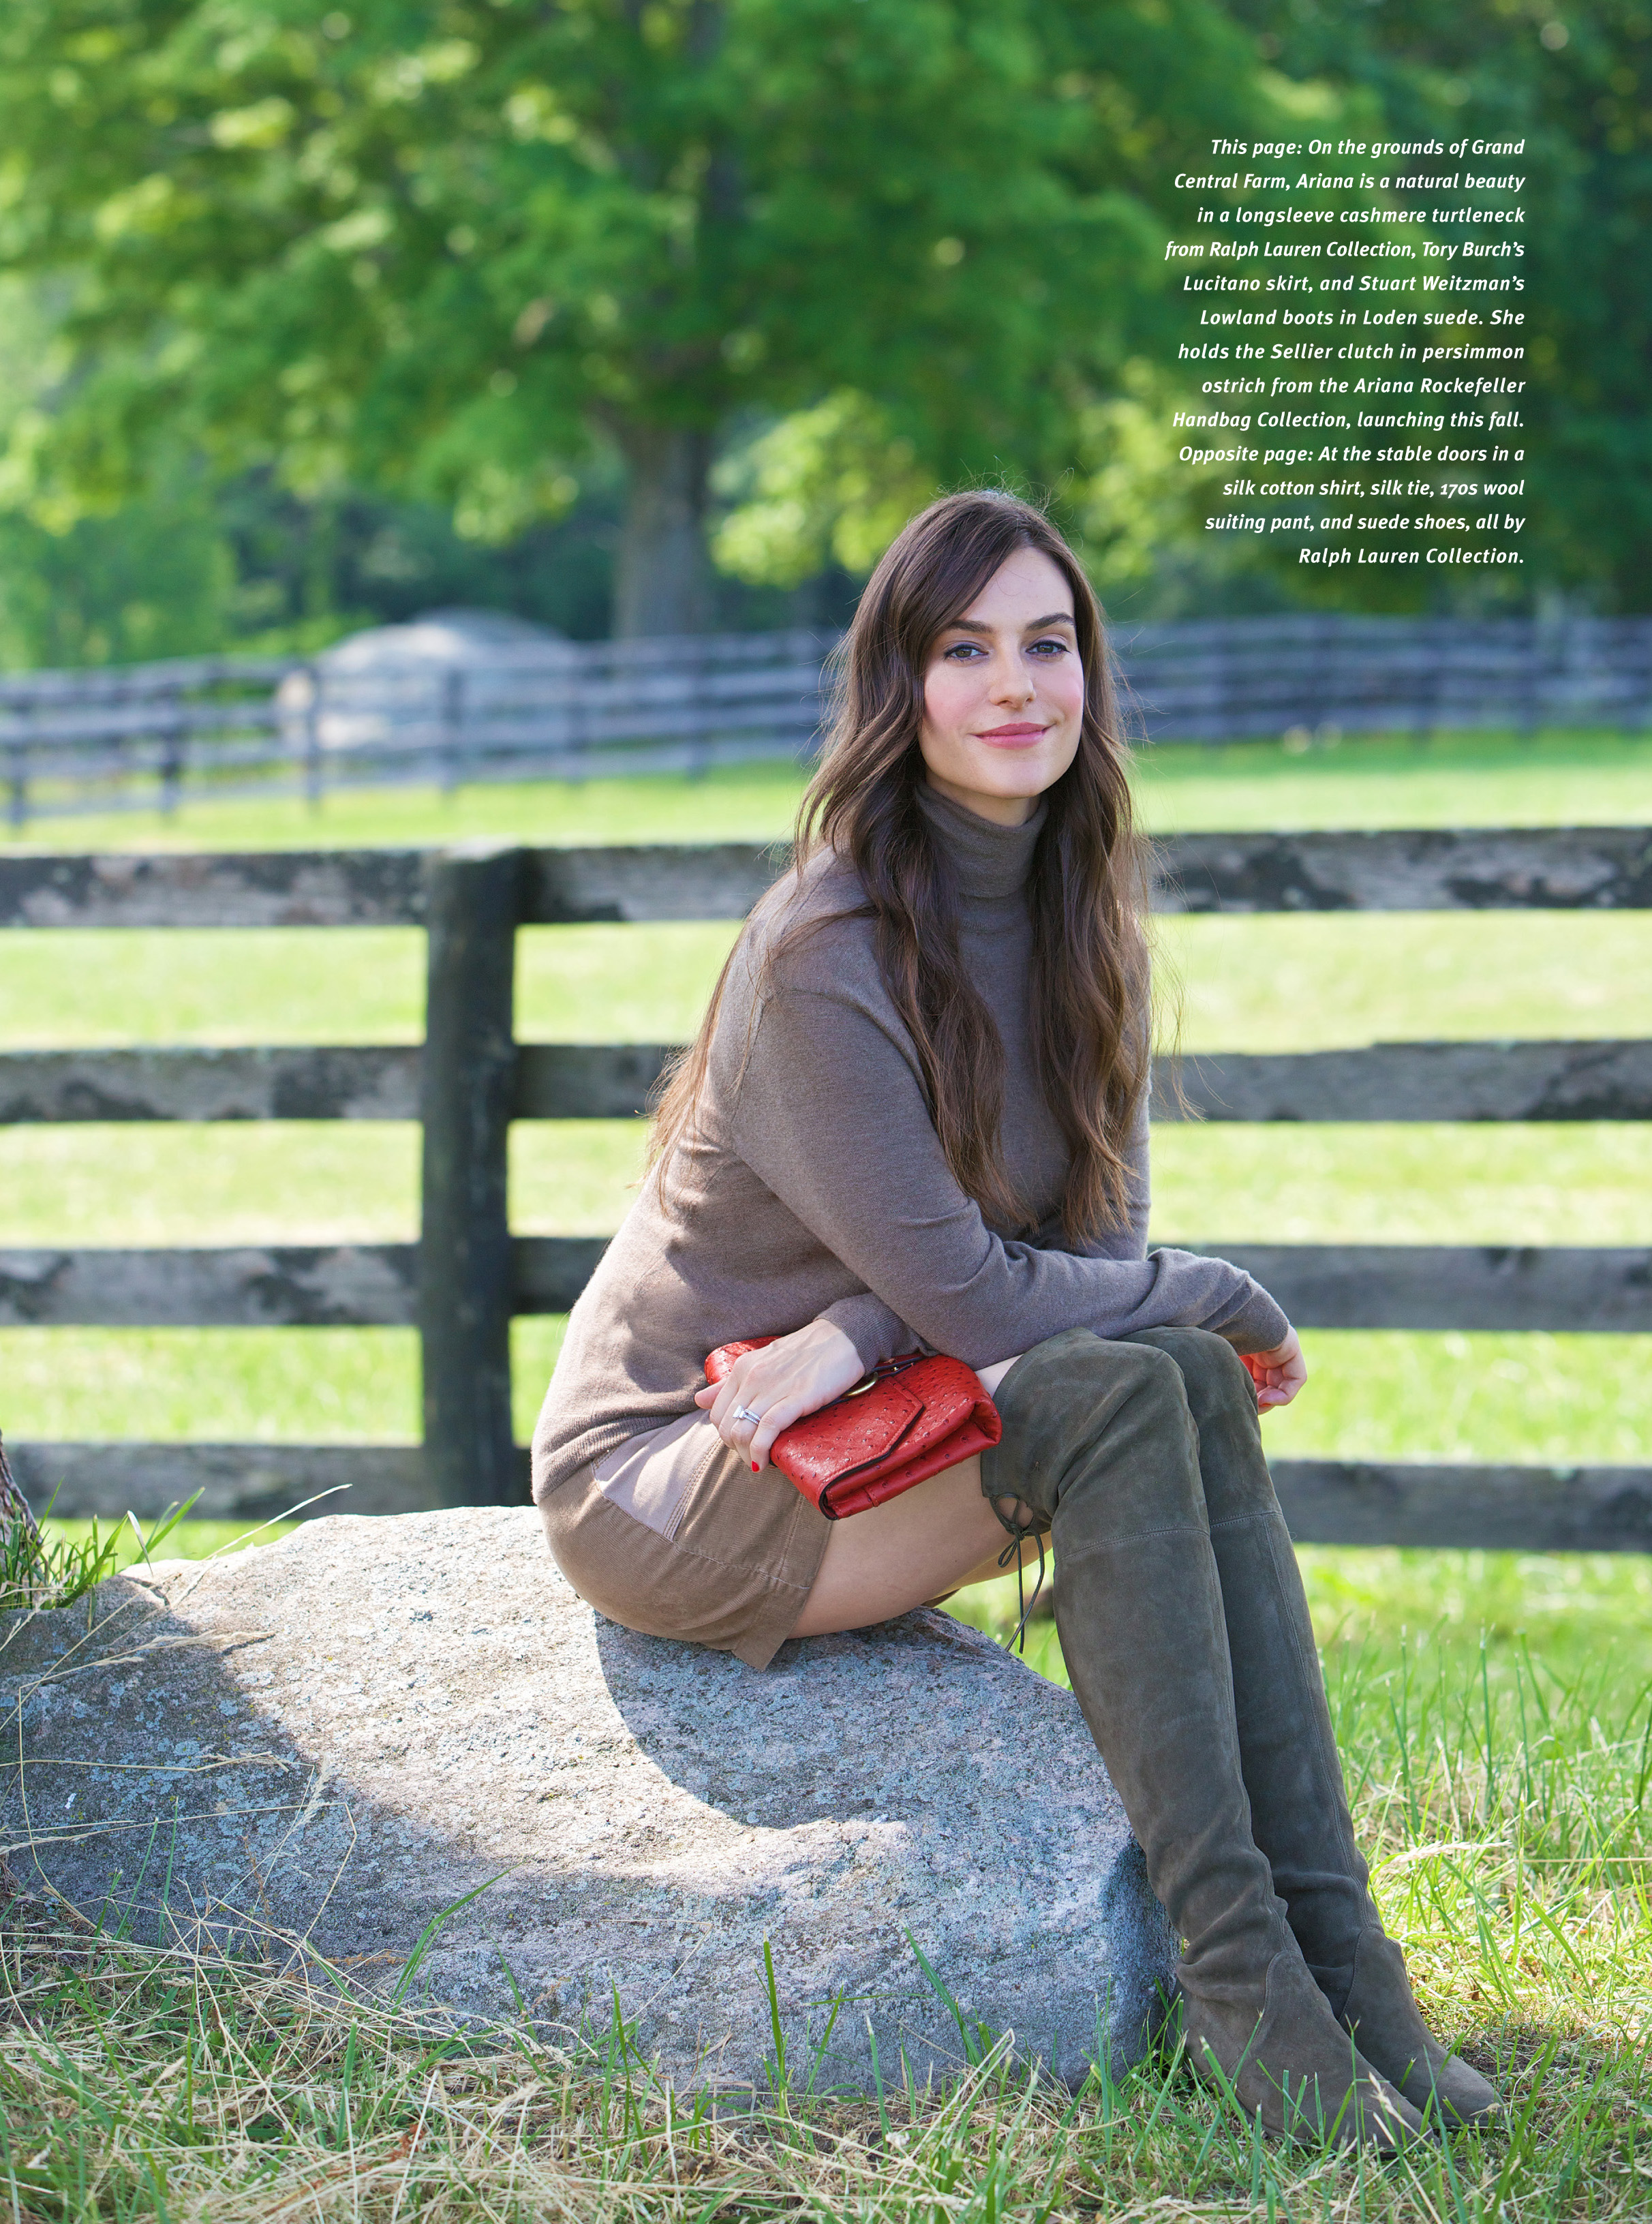 Quest_September_2016_Ariana_Rockefeller-2 copy.jpg